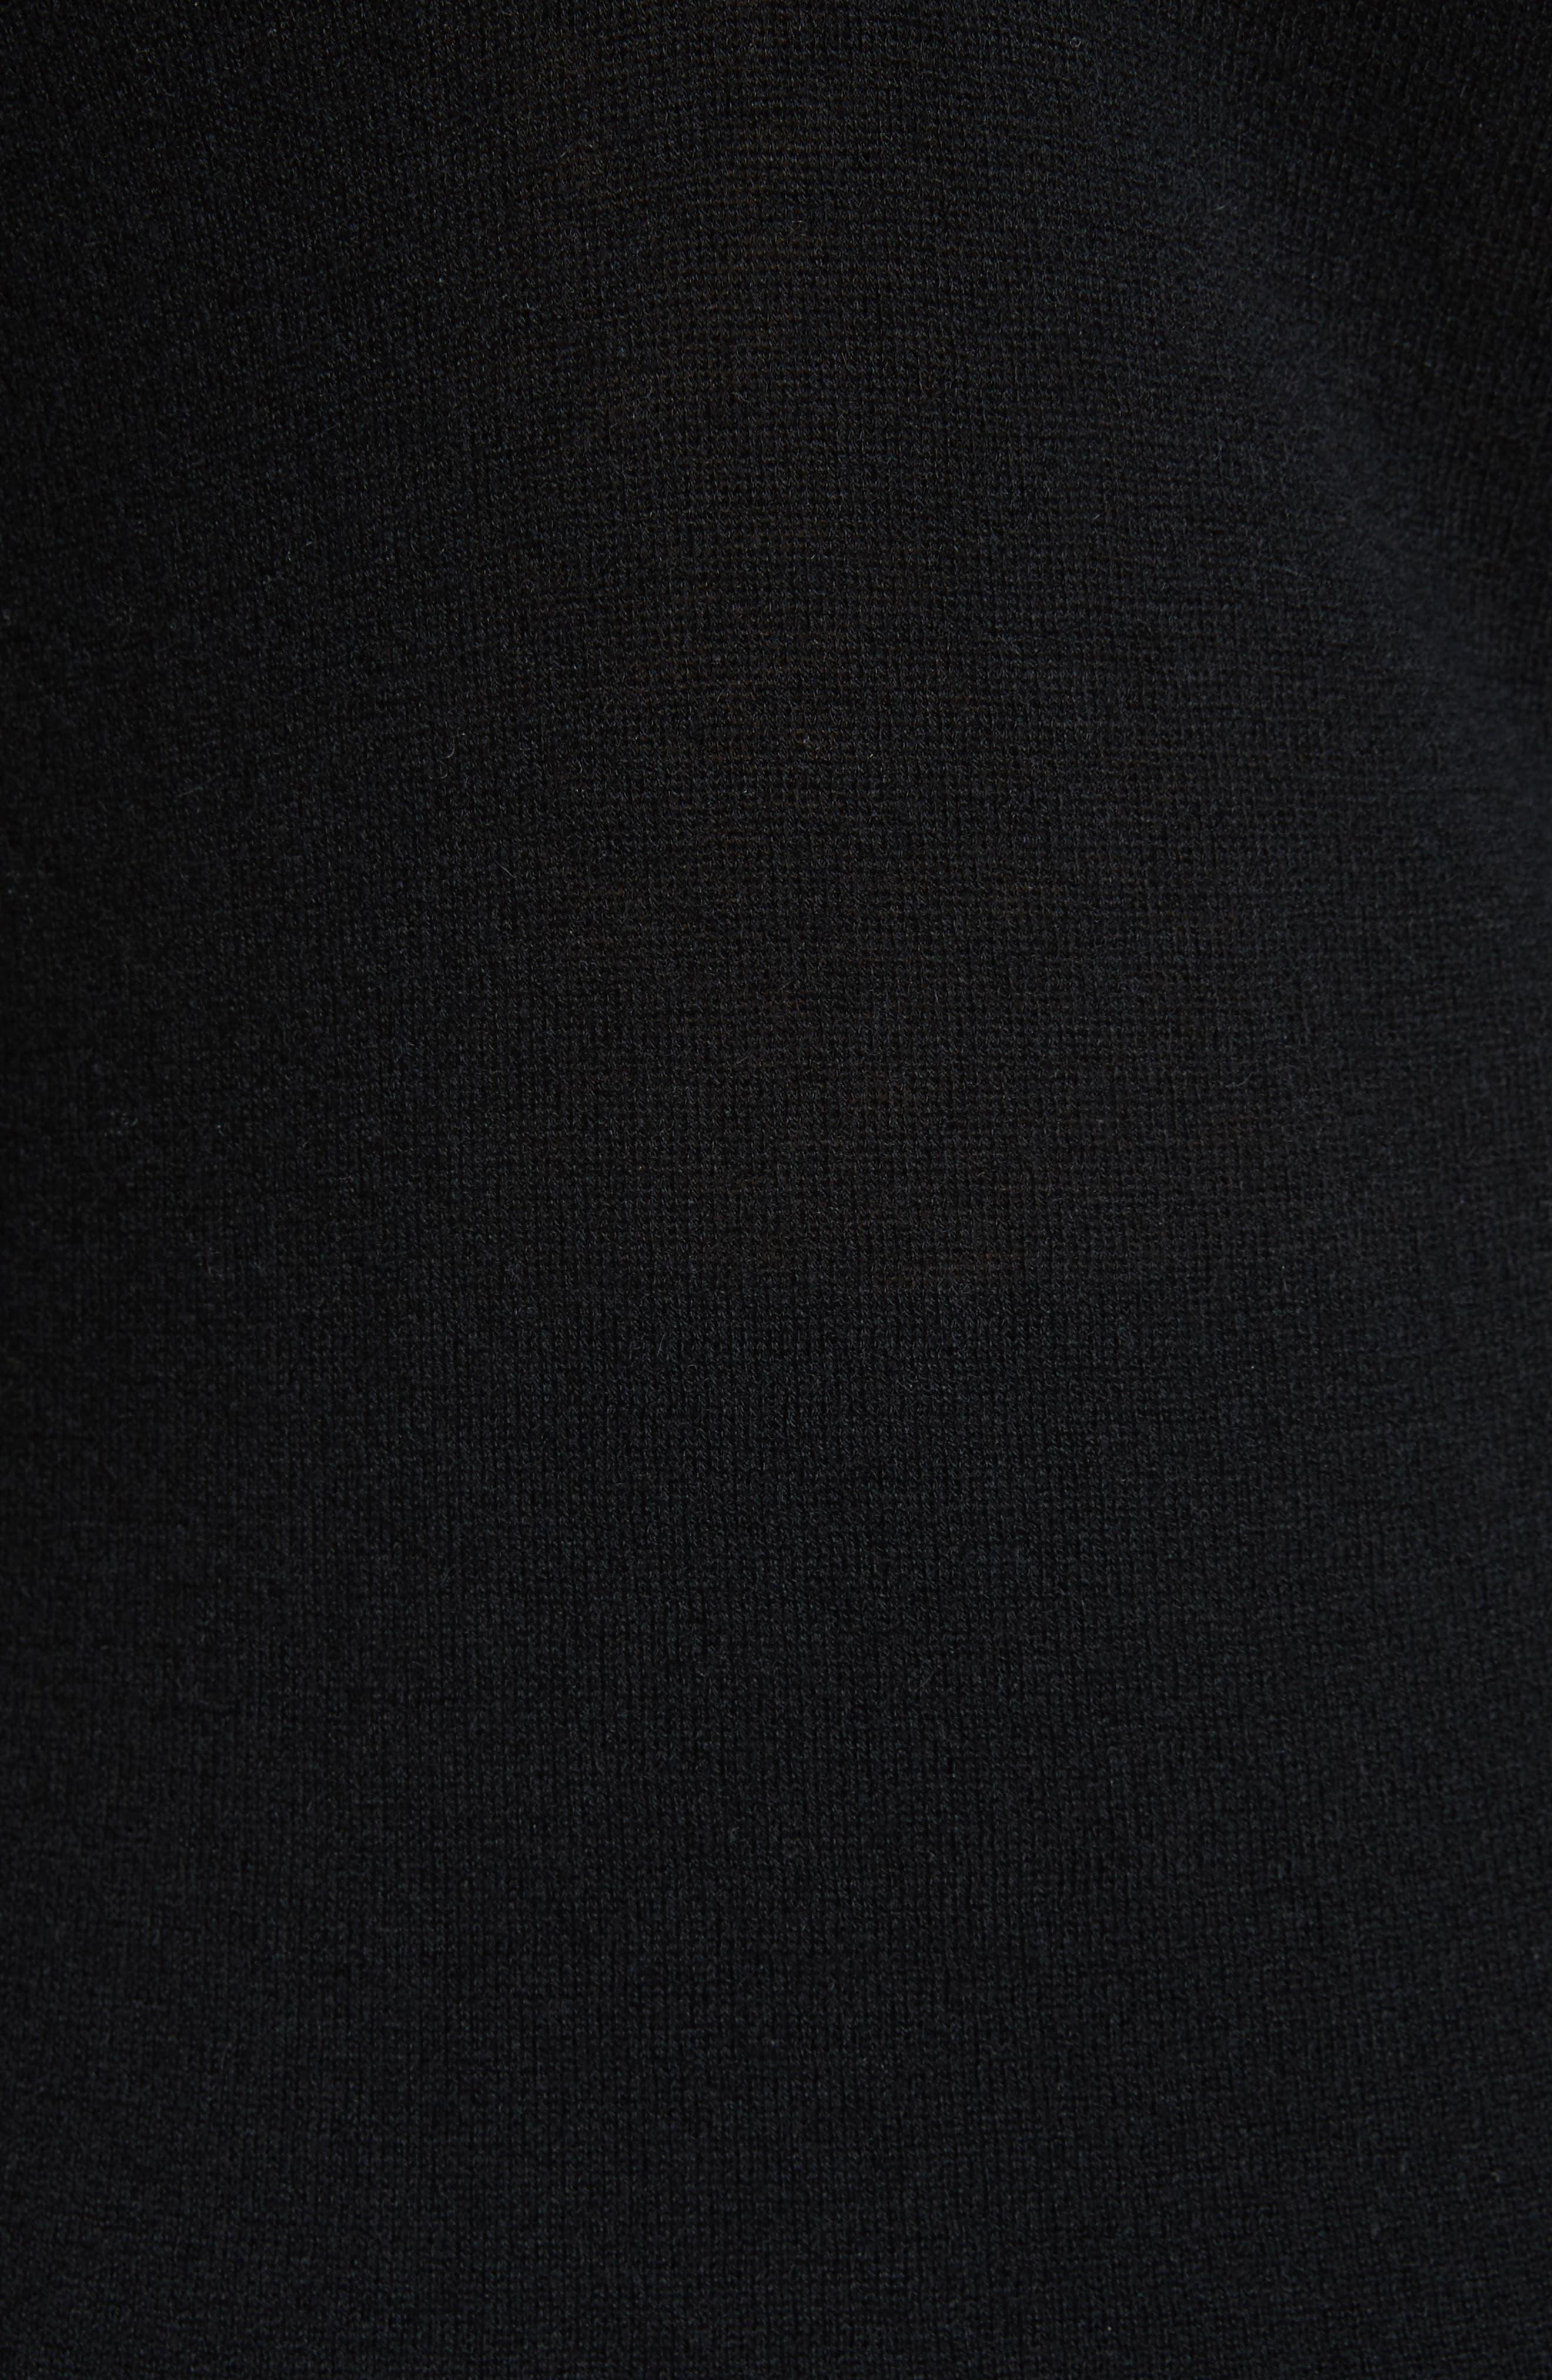 Cashmere V-Back Cashmere Sweater,                             Alternate thumbnail 5, color,                             001